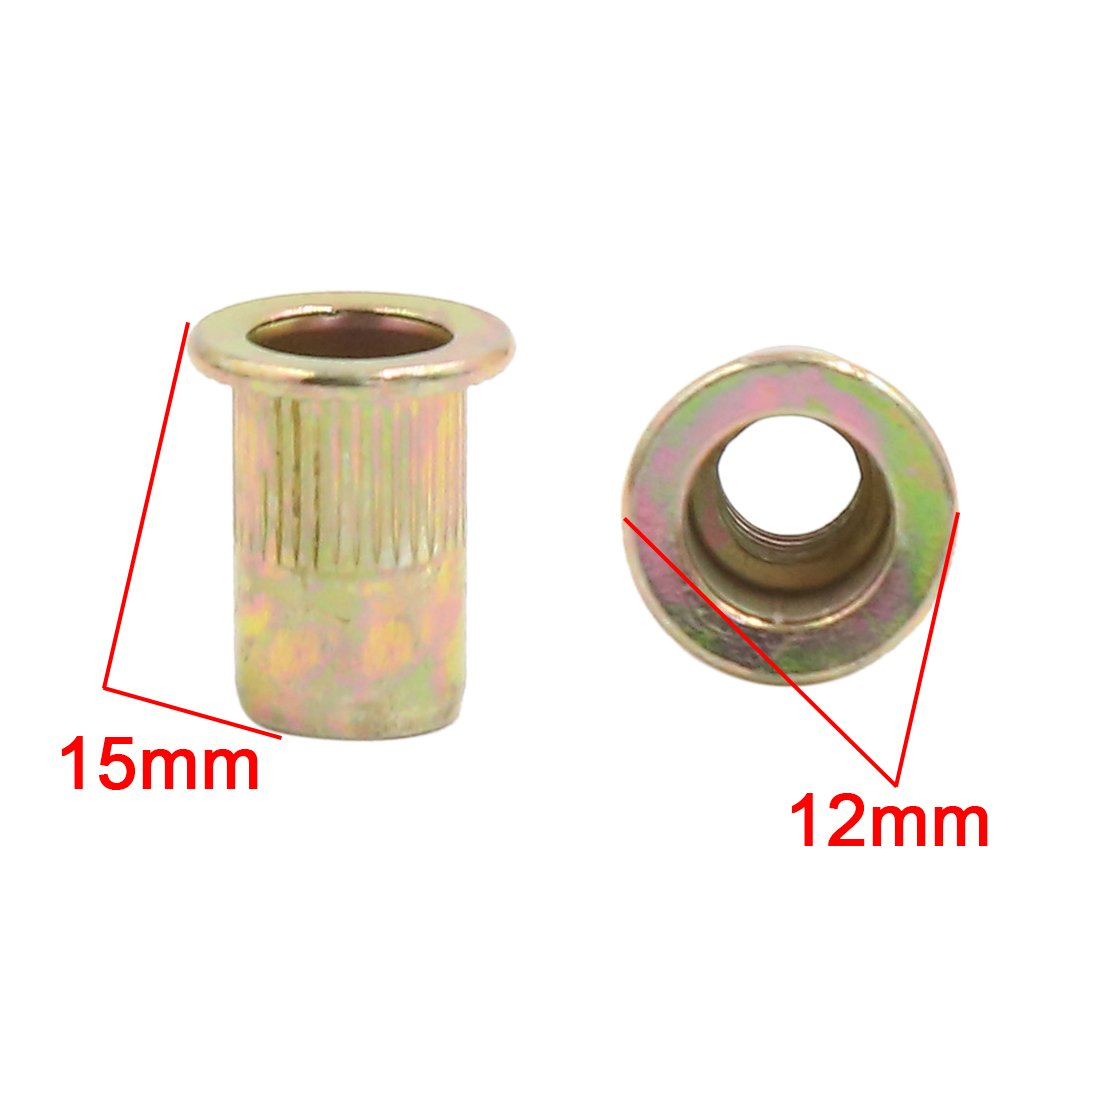 uxcell 200 Pcs 1//4-20 Bronze Tone Zinc Plated Stainless Steel Thread Rivet Nut Insert Nutserts